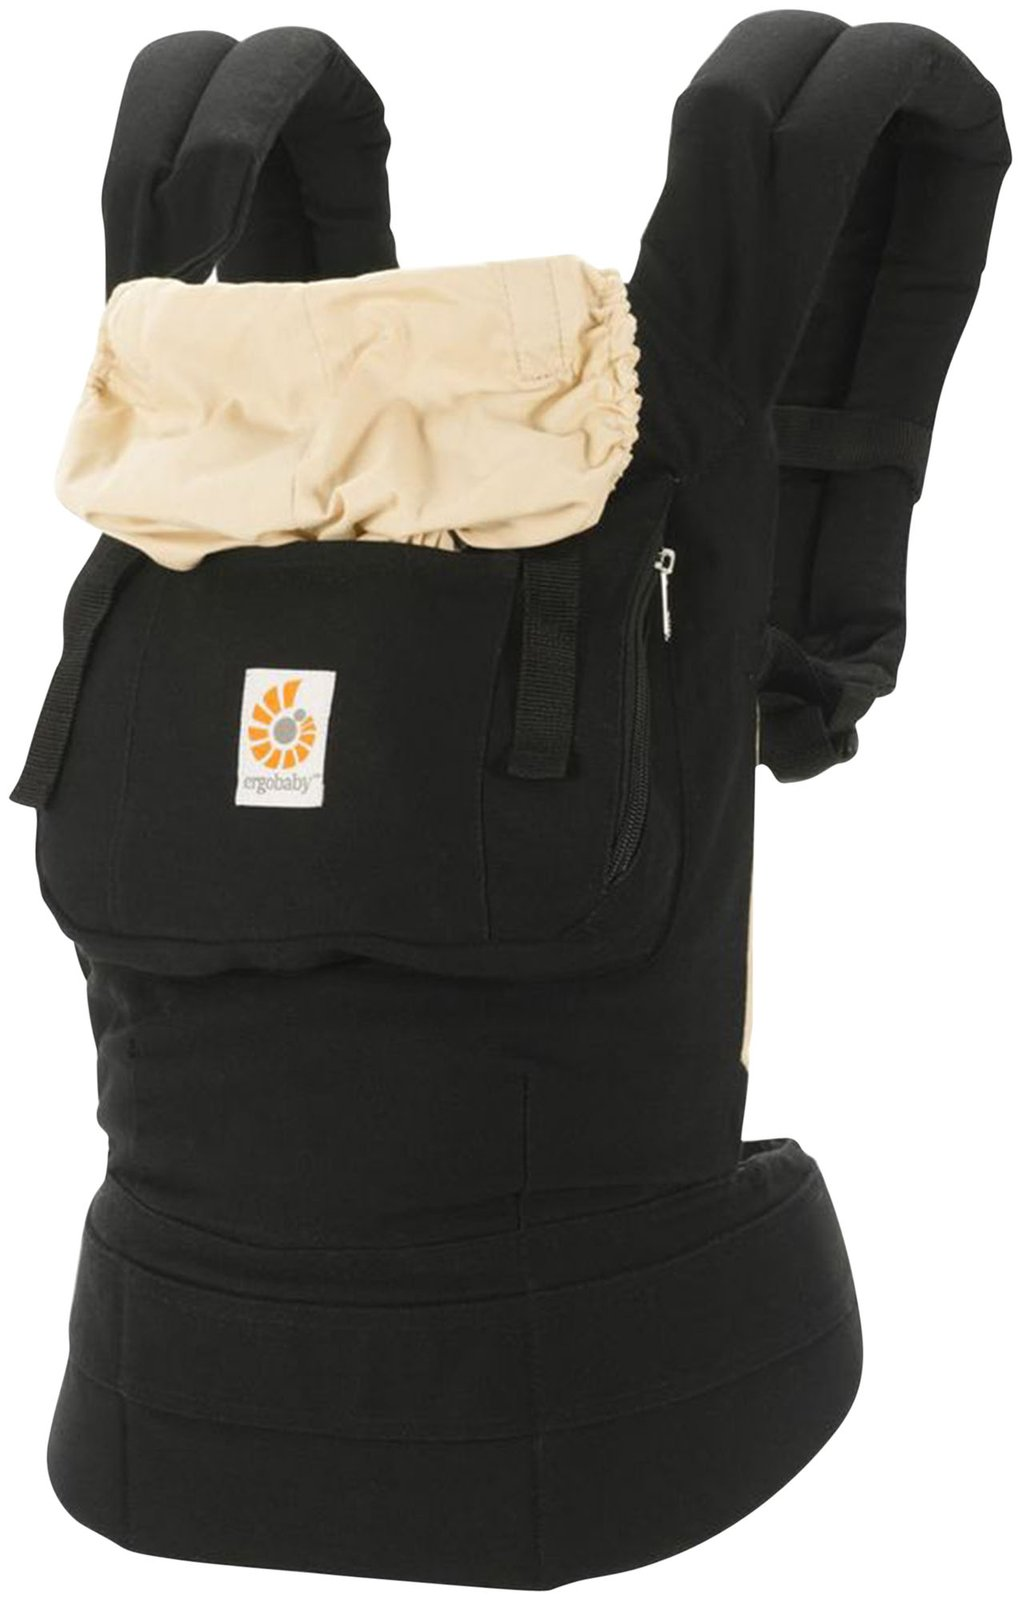 Ergo Baby Original Baby Carrier in Black/Camel